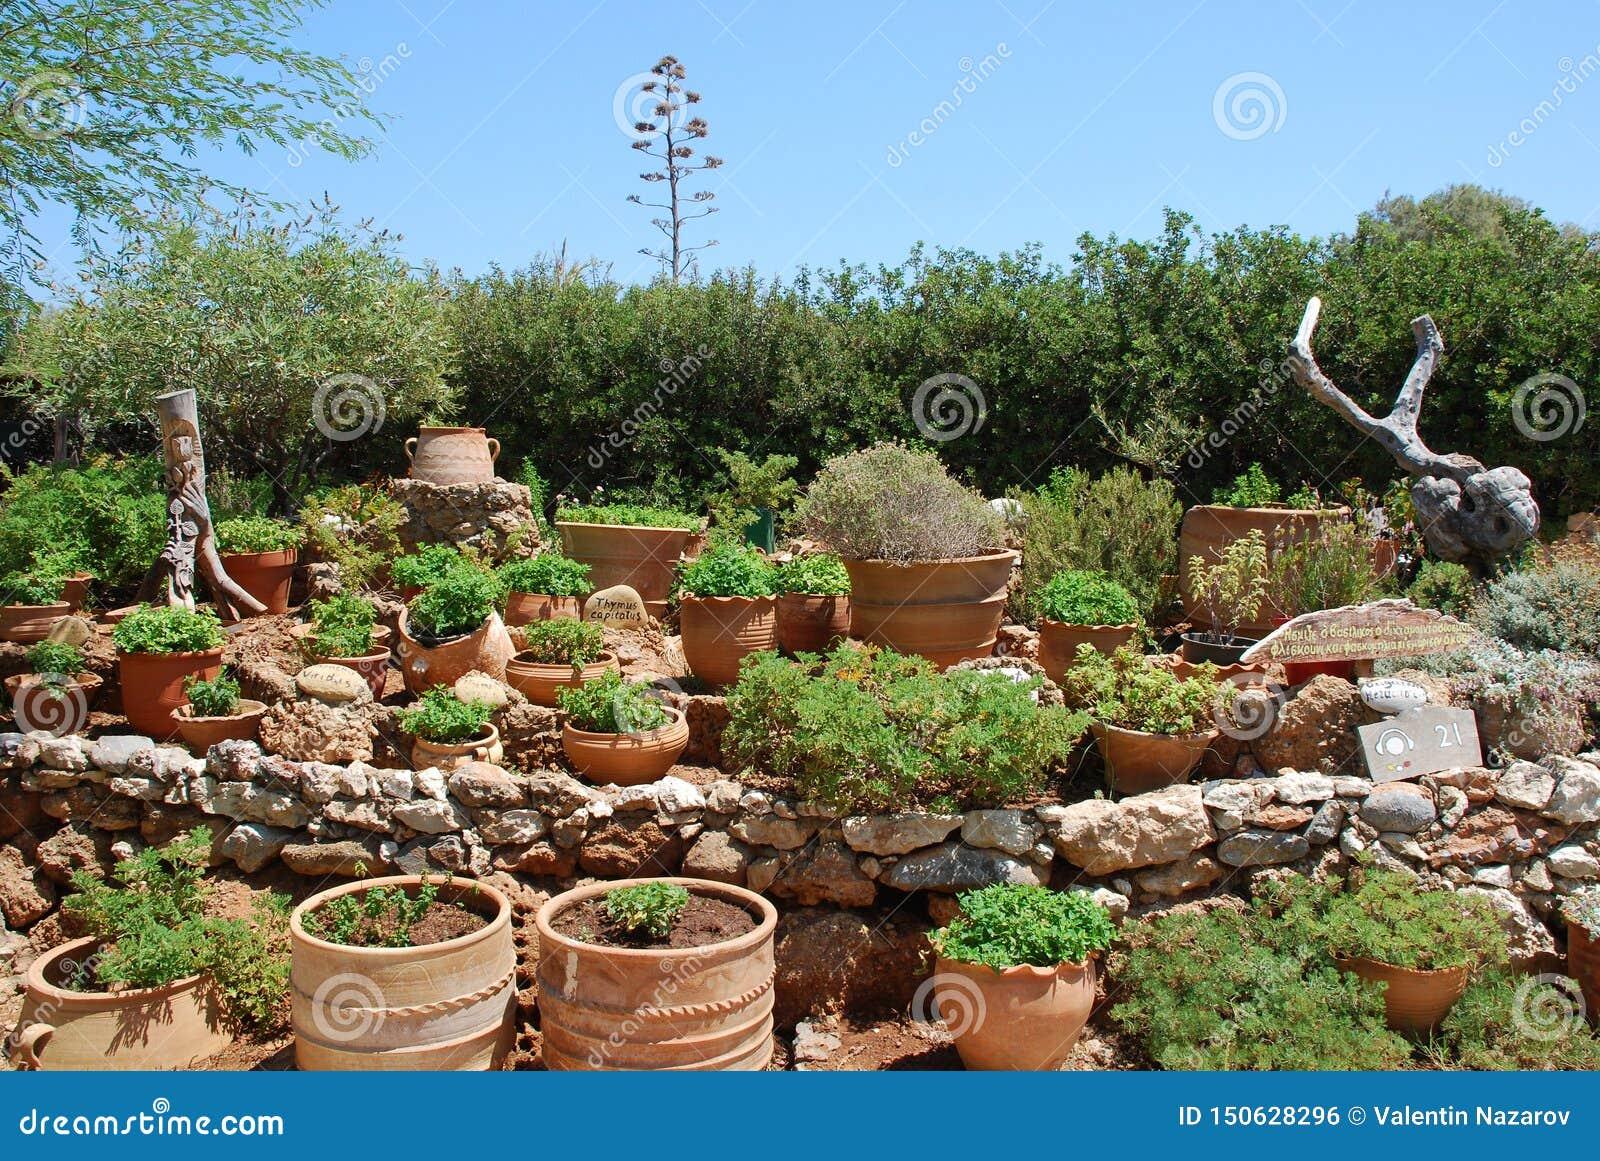 Chersonissos,塞浦路斯,希腊- 31 07 2013年:庭院植物和花卉生长在泥罐